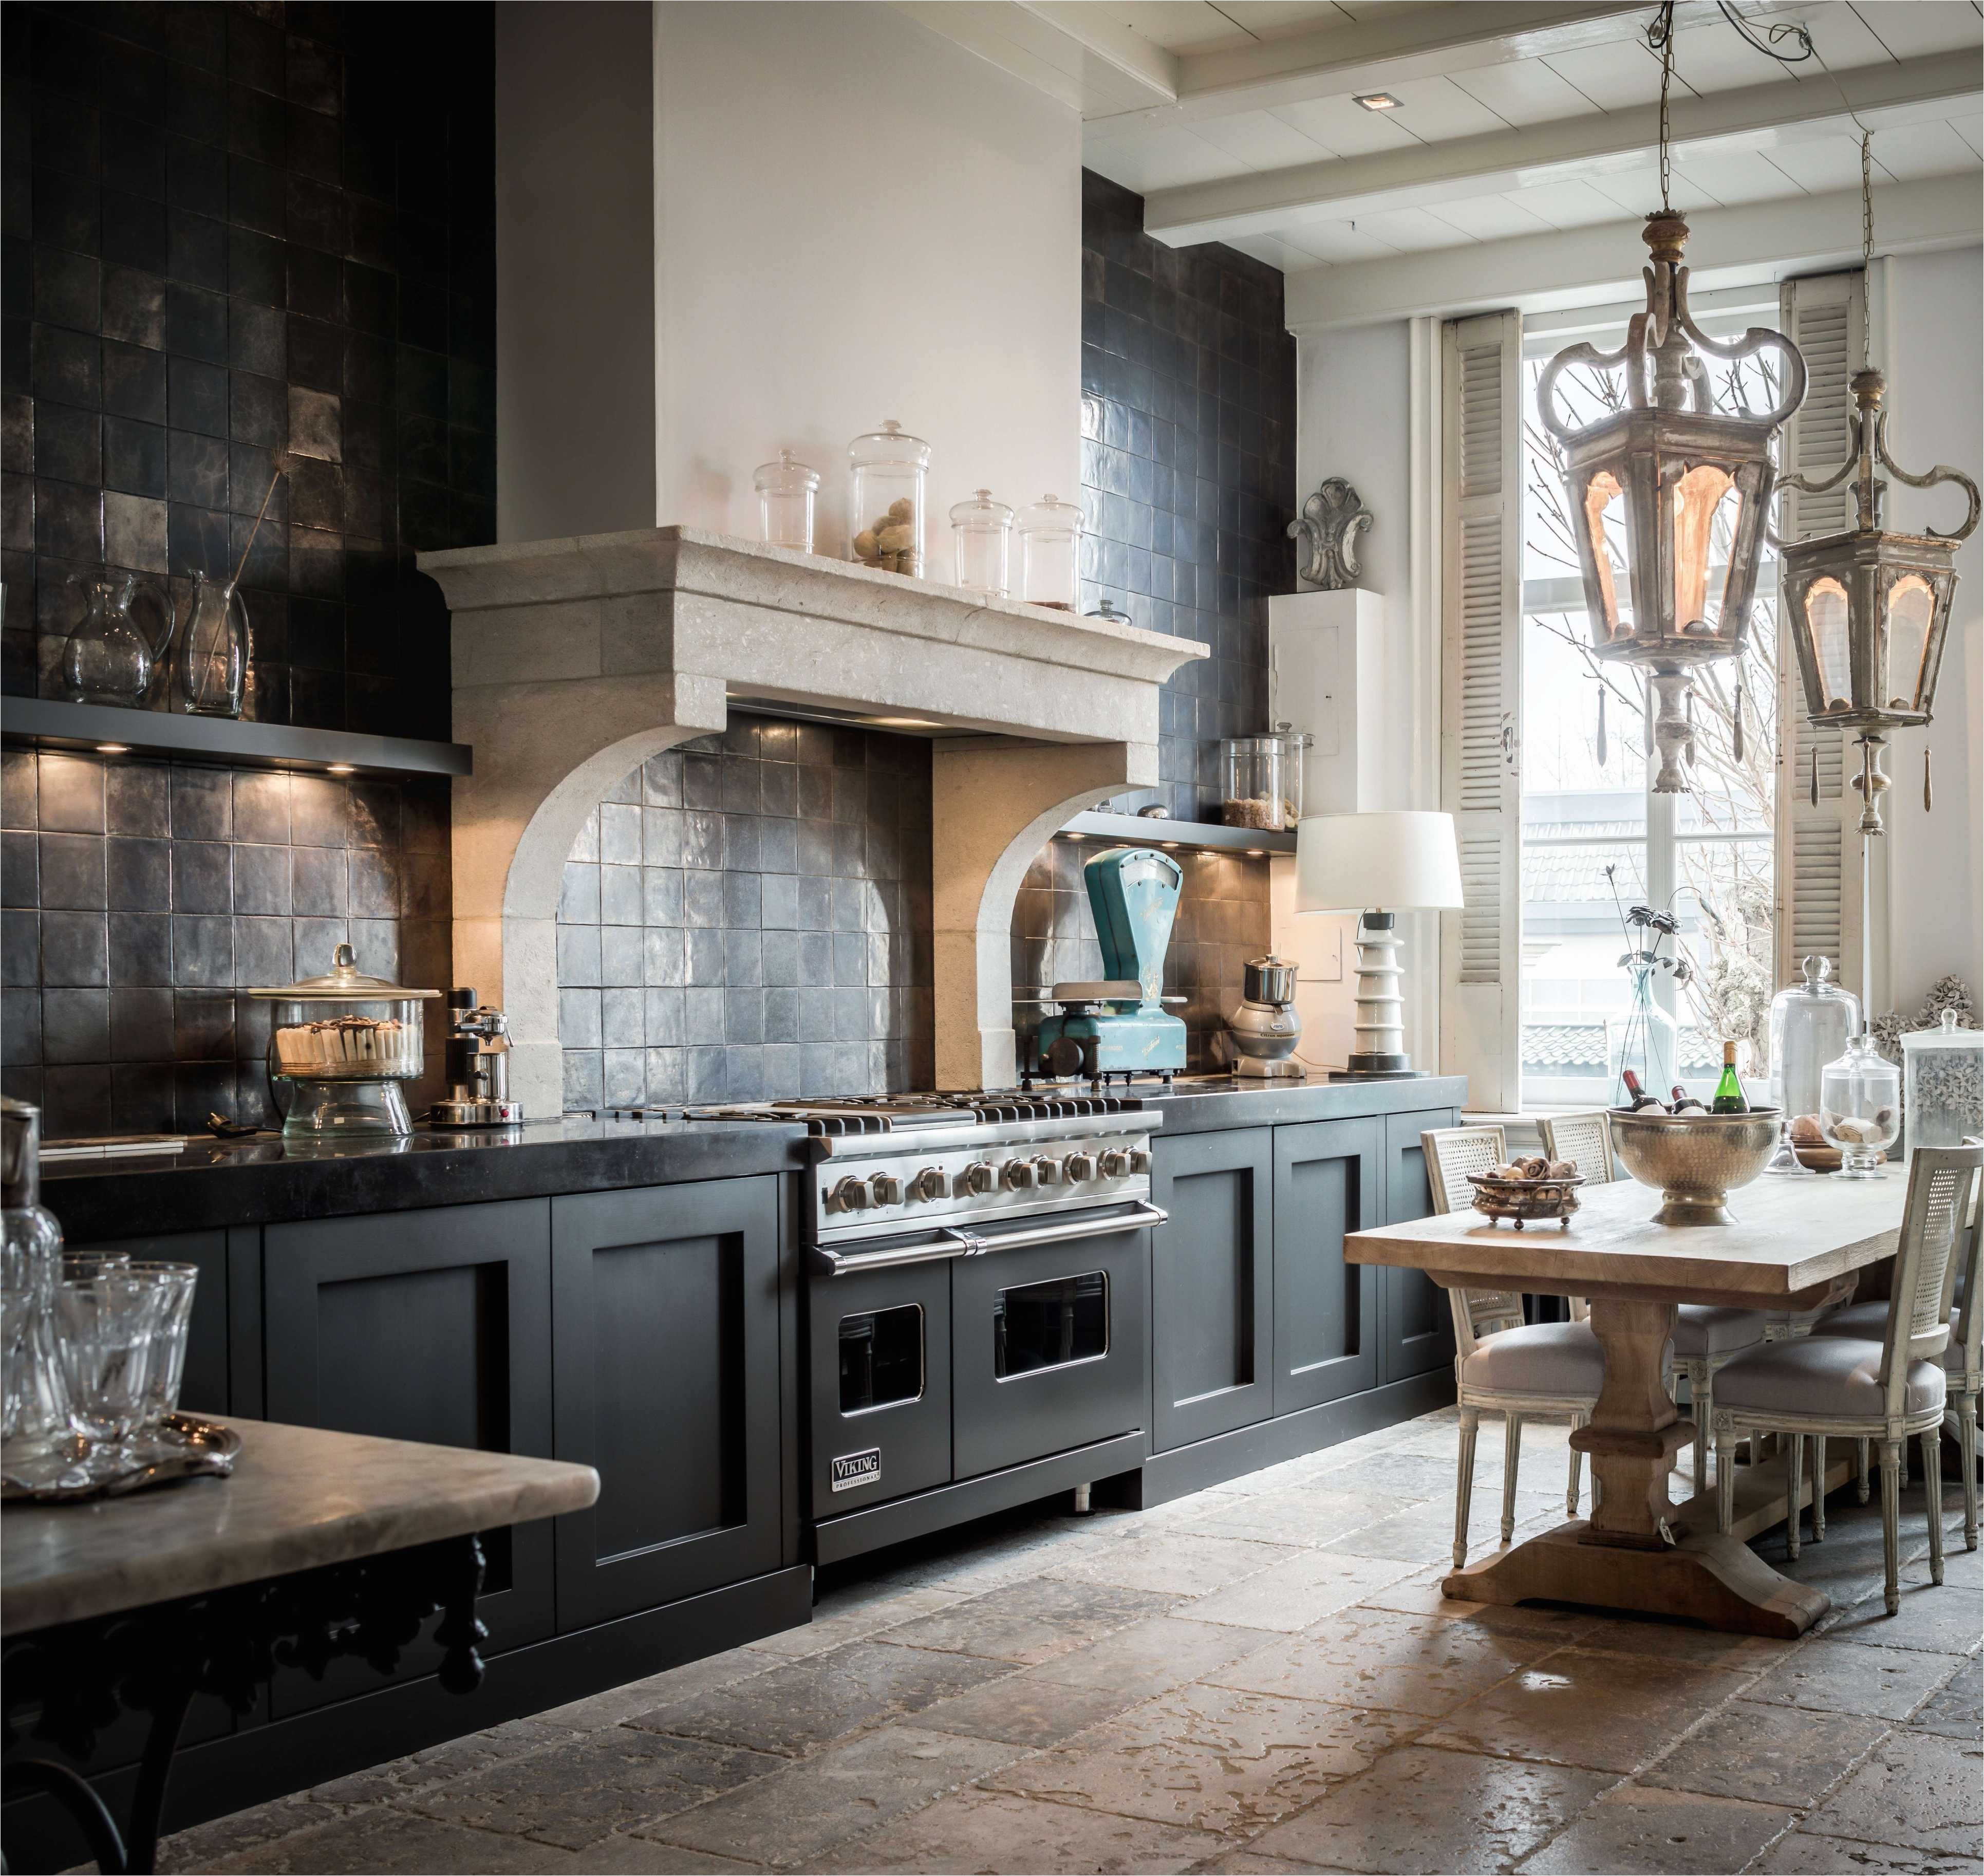 Kitchen Blue Tiles Design Beautiful Tiles Design White Cabinets In Kitchen Luxury Kitchen Cabinet 0d